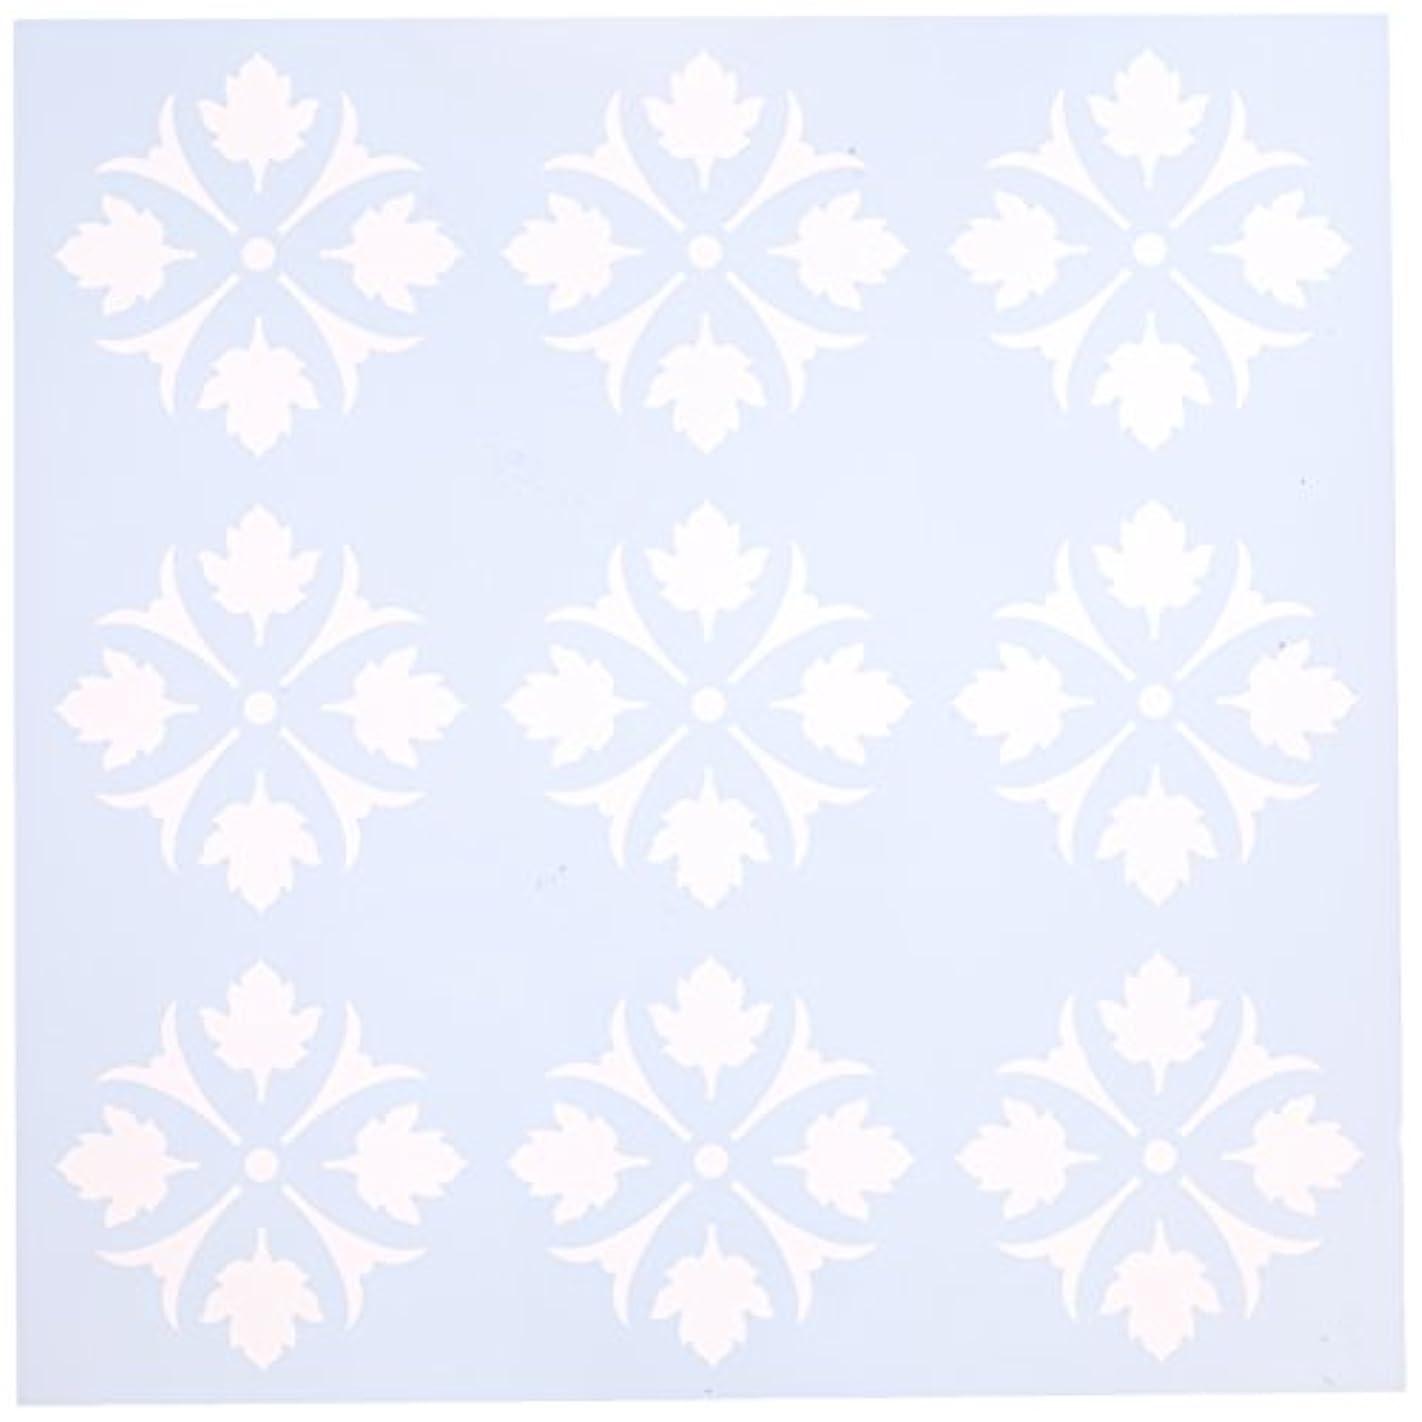 CLEARSNAP Clear Scraps Celtic Pattern Stencils, 12 by 12 u56929865873